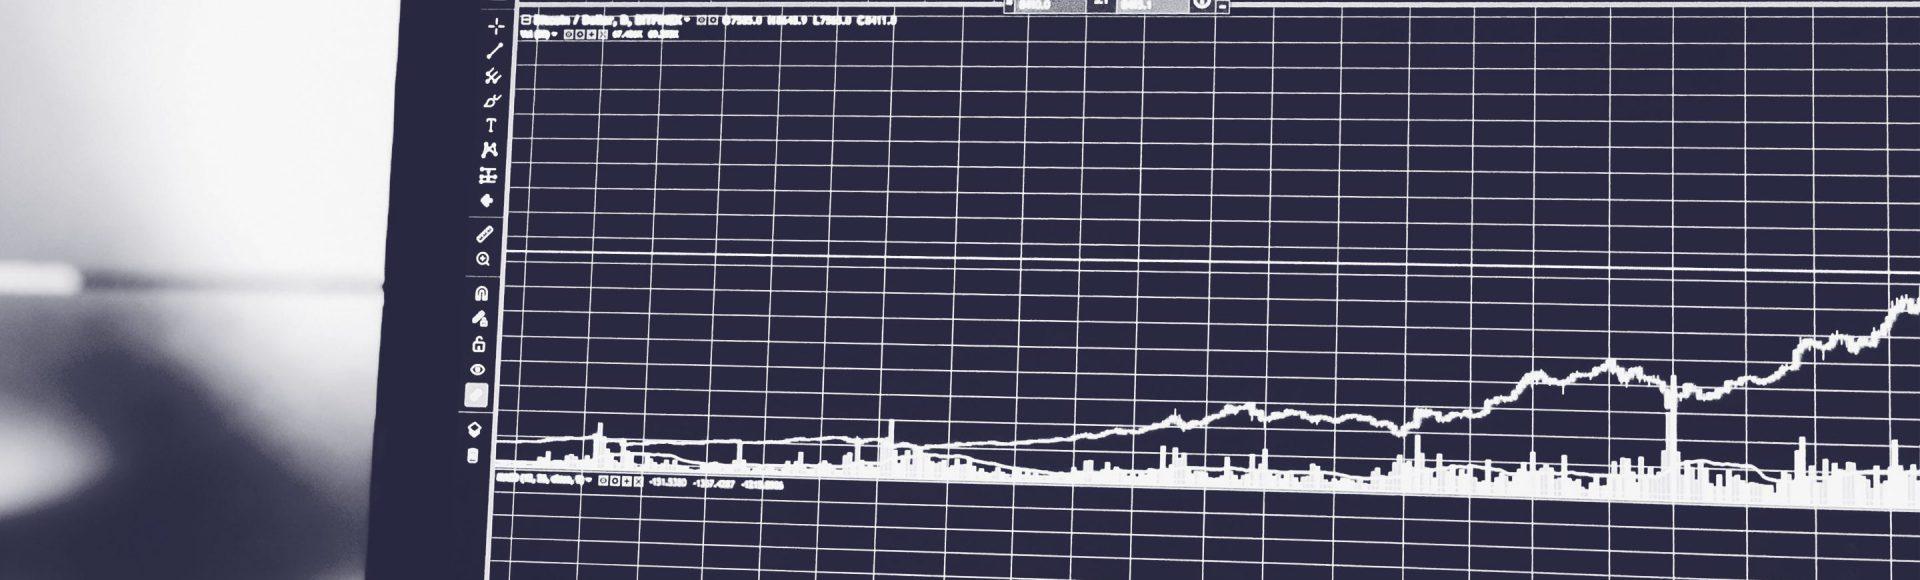 ARK-Invest_Blog-Banner_2015_09_22---Bitcoin-4_5